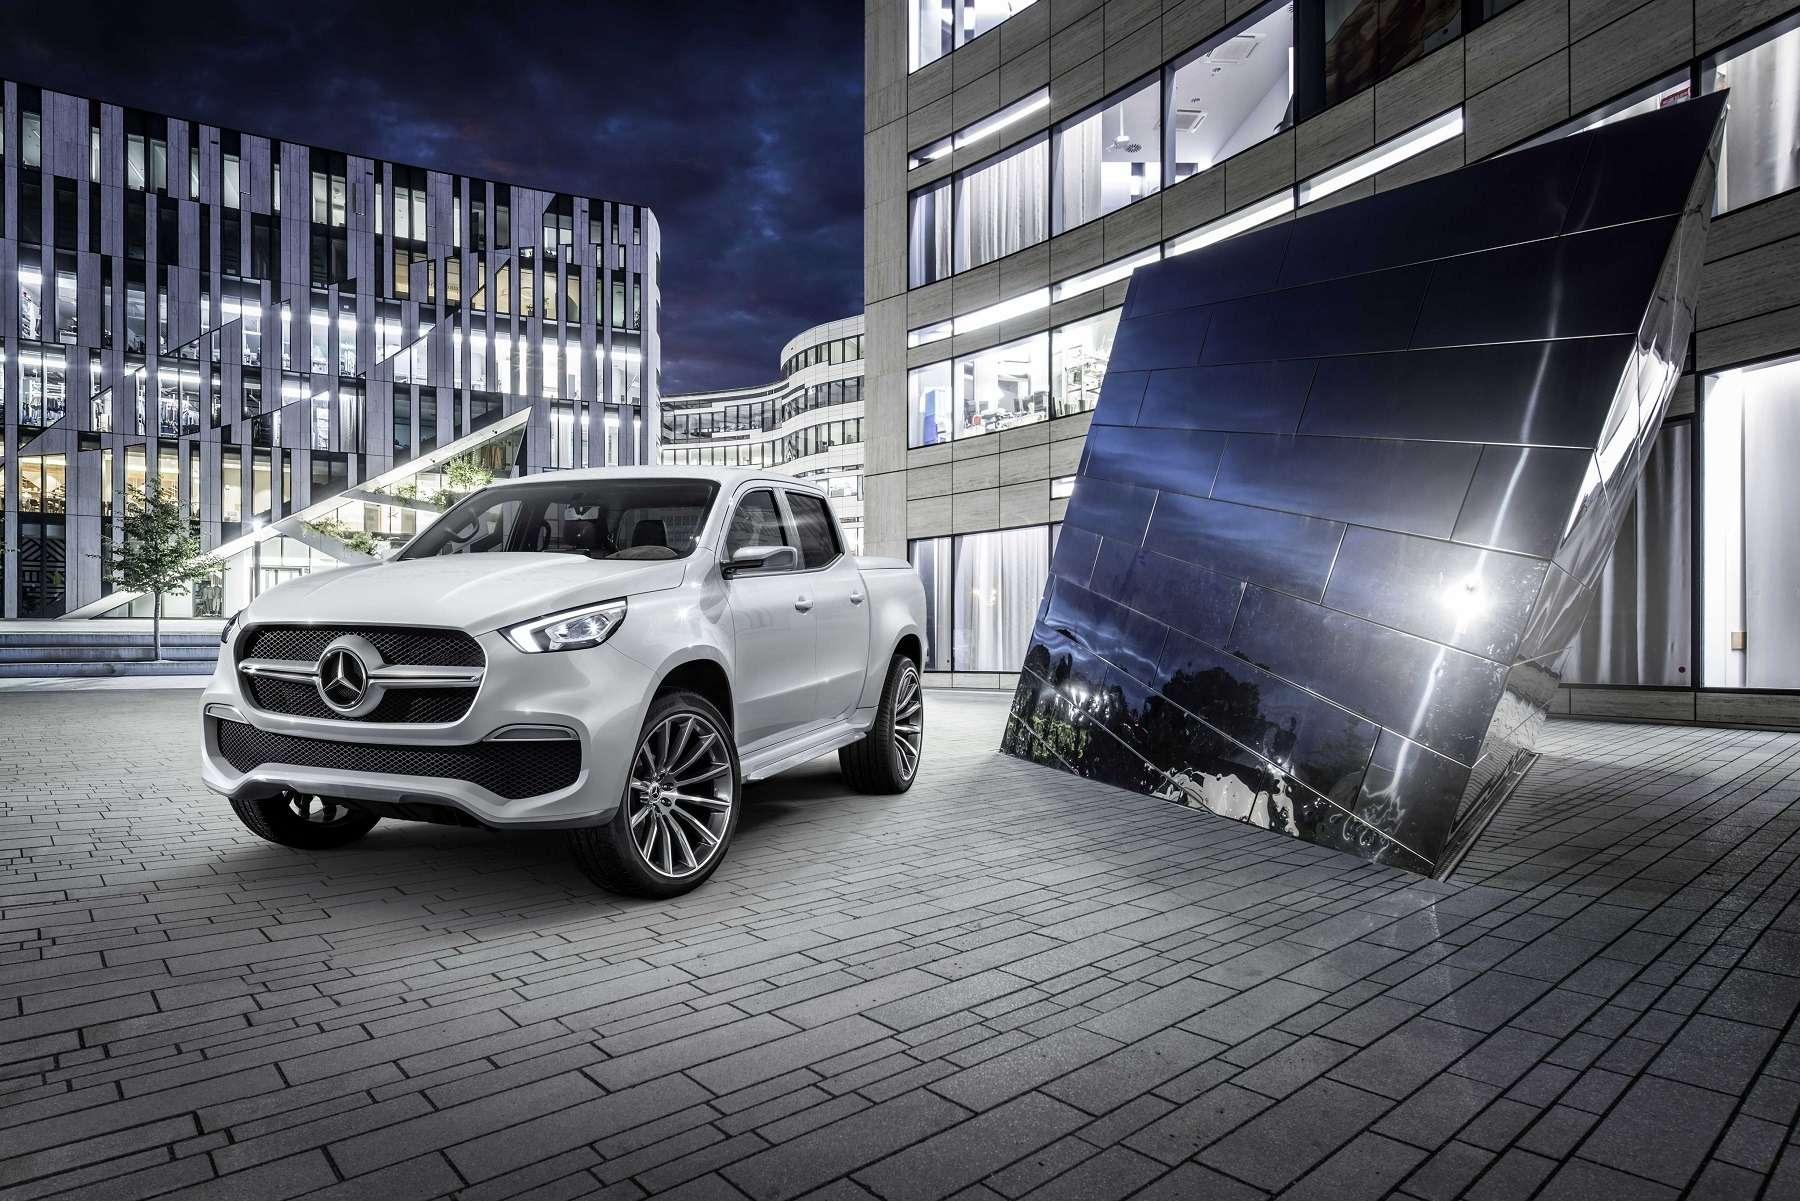 Дело чести: Mercedes-Benz представил пикапы X-класса— фото 654282